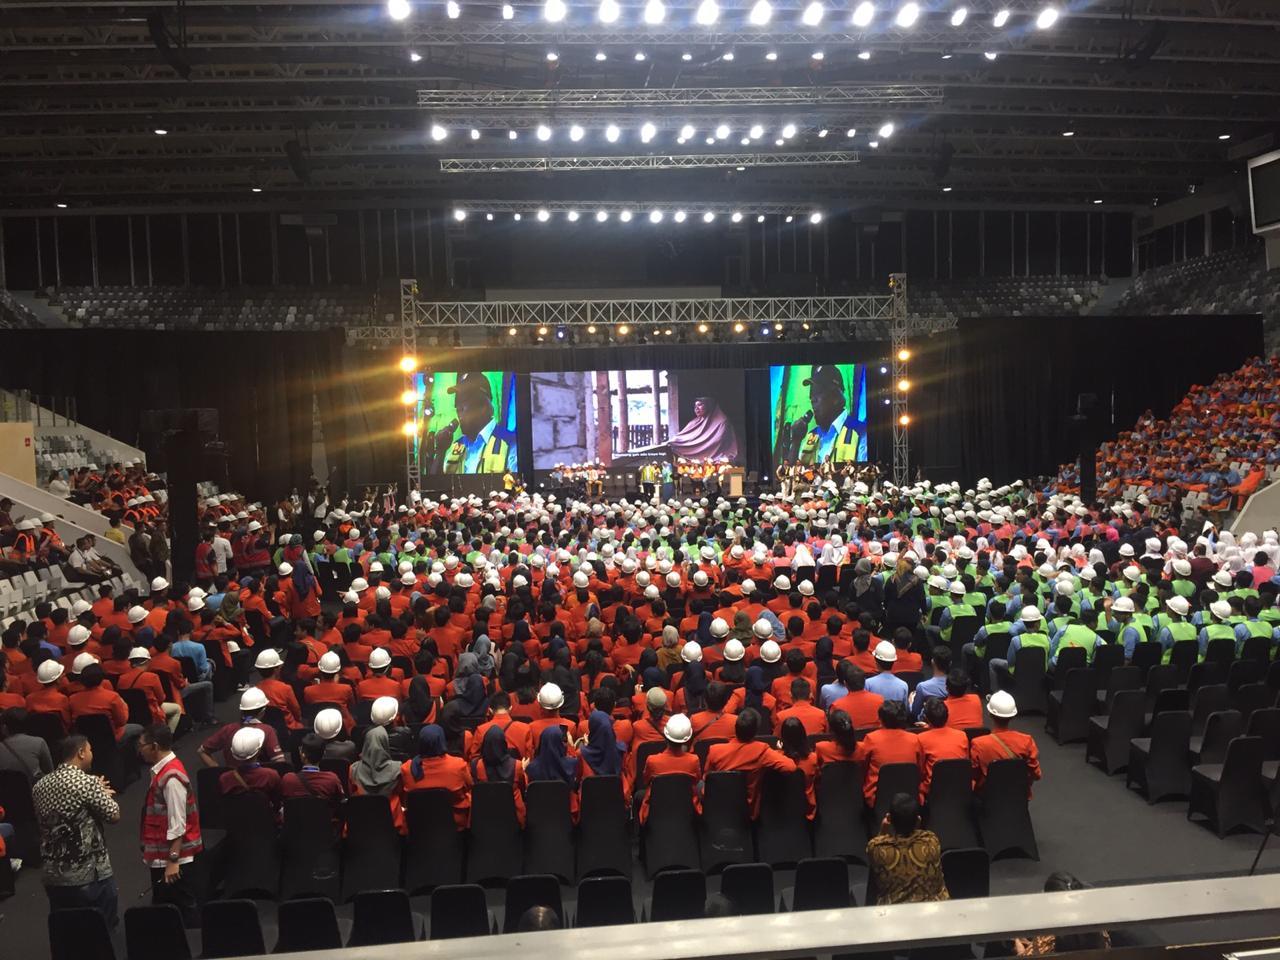 https: img.okeinfo.net content 2019 03 12 470 2029006 bagikan-16-000-sertifikat-menteri-pupr-presiden-jokowi-ingin-tenaga-konstruksi-premium-lFe3G19rNO.jpg